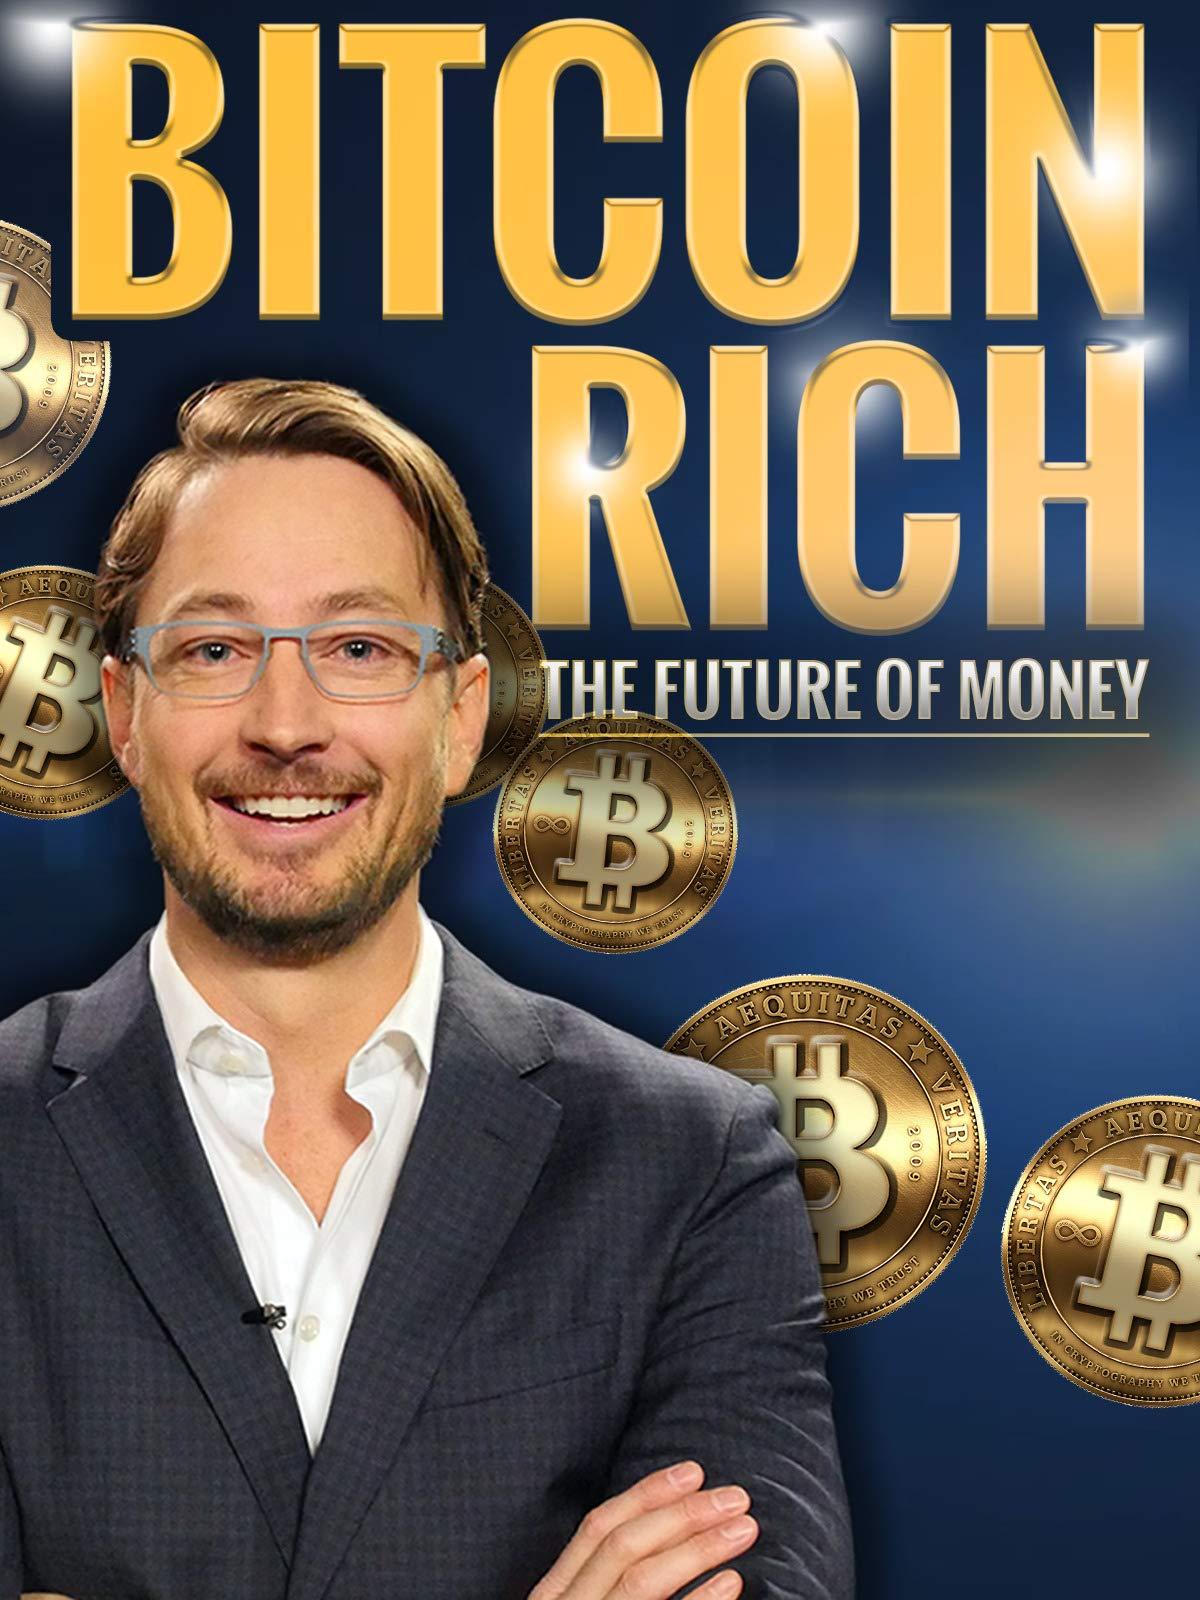 Bitcoin Rich: The Future of Money